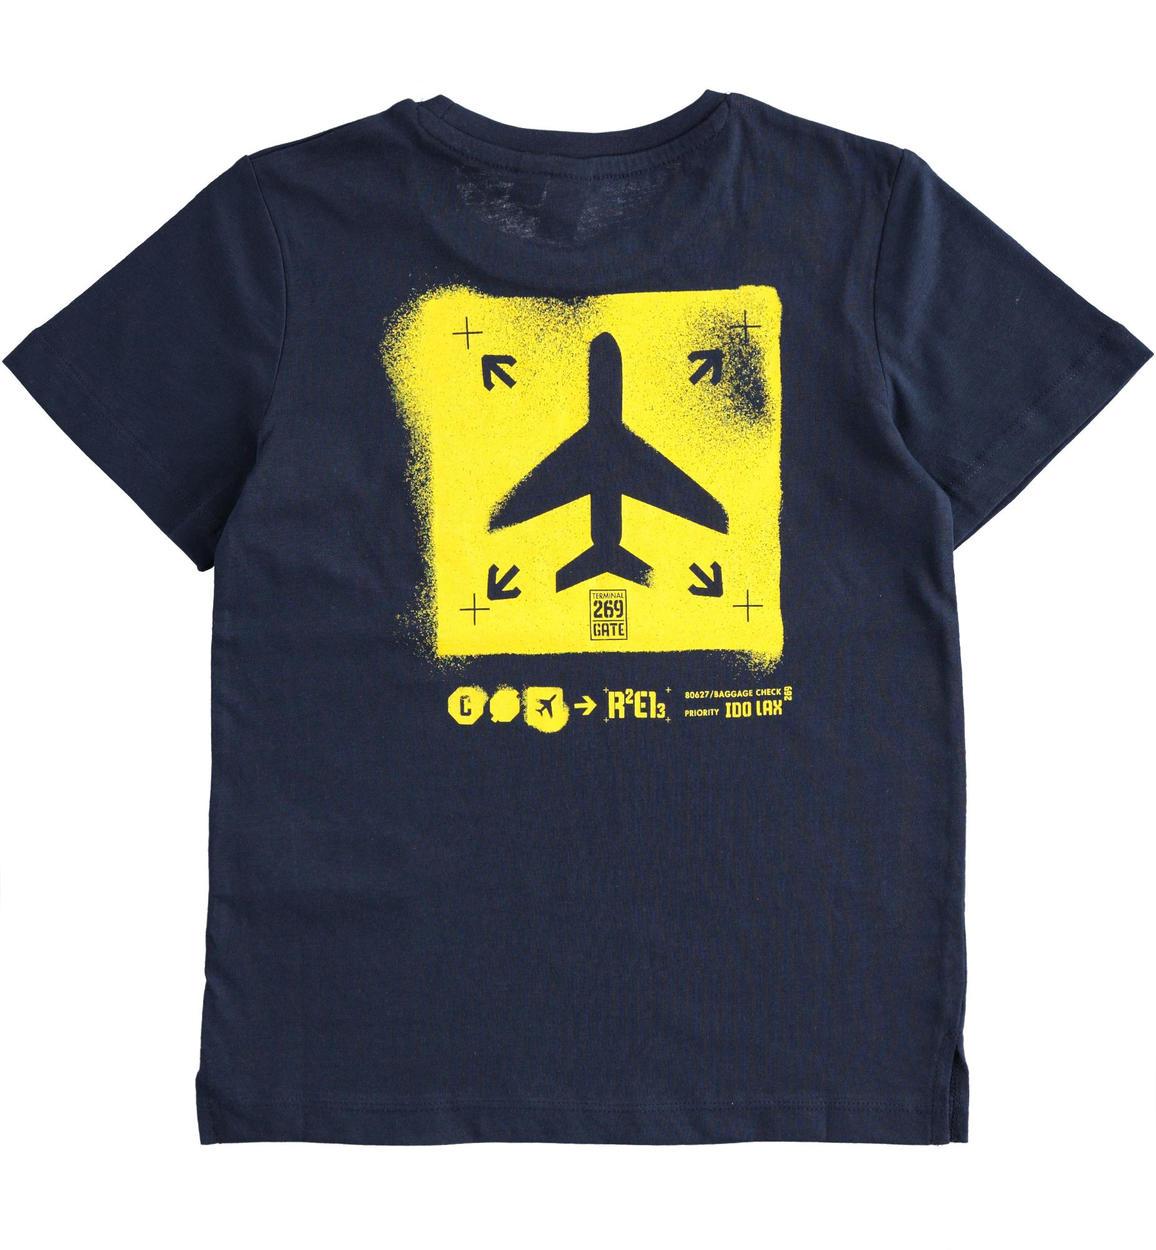 grintosa tshirt 100 cotone con aereo p navy retro 02 2434j38600 3885 150x150